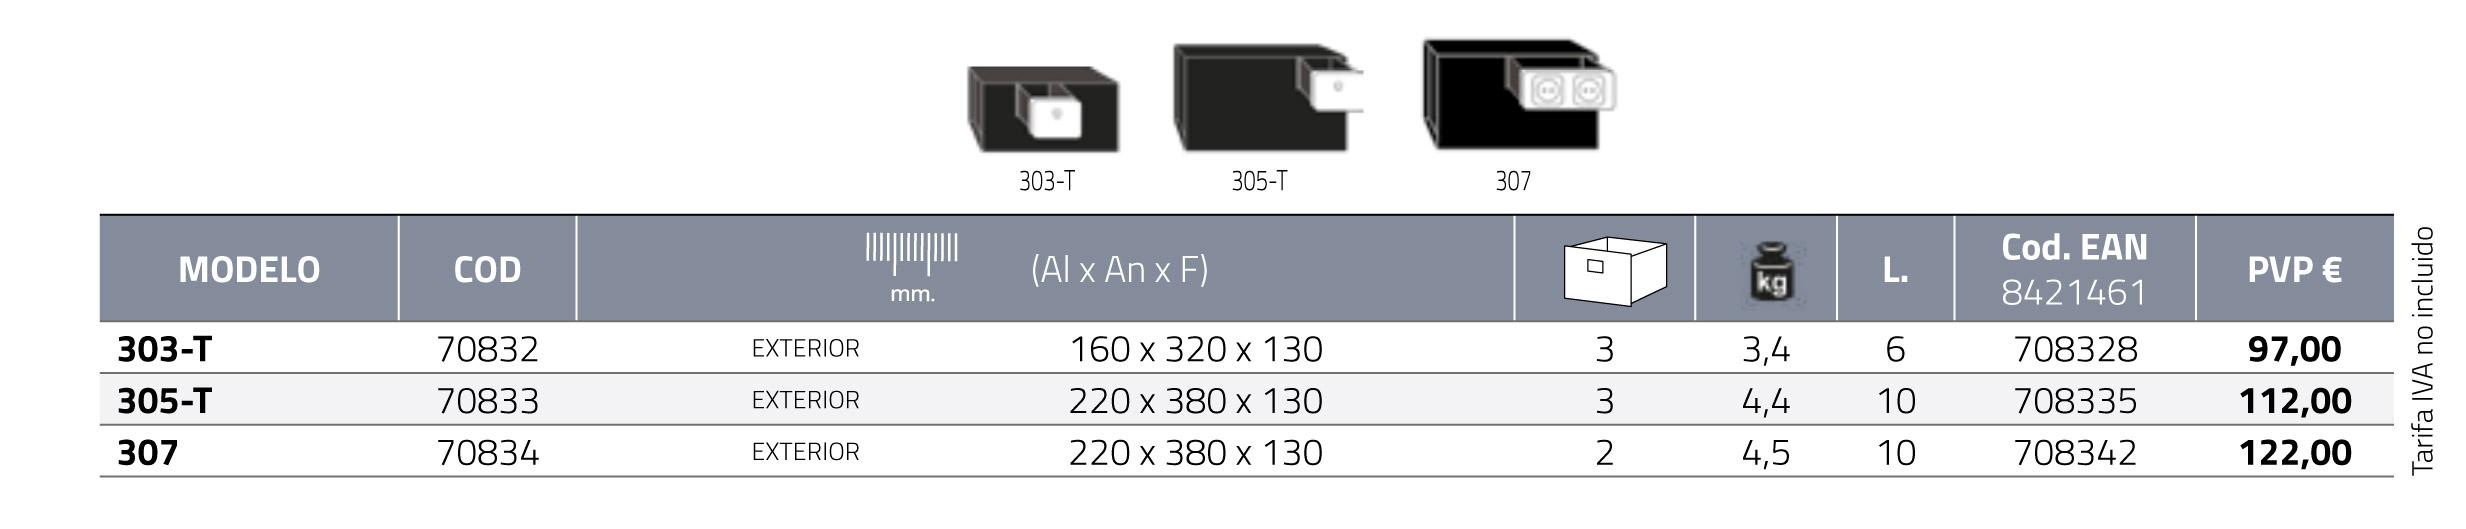 Características técnicas cajas fuertes modelo Secret